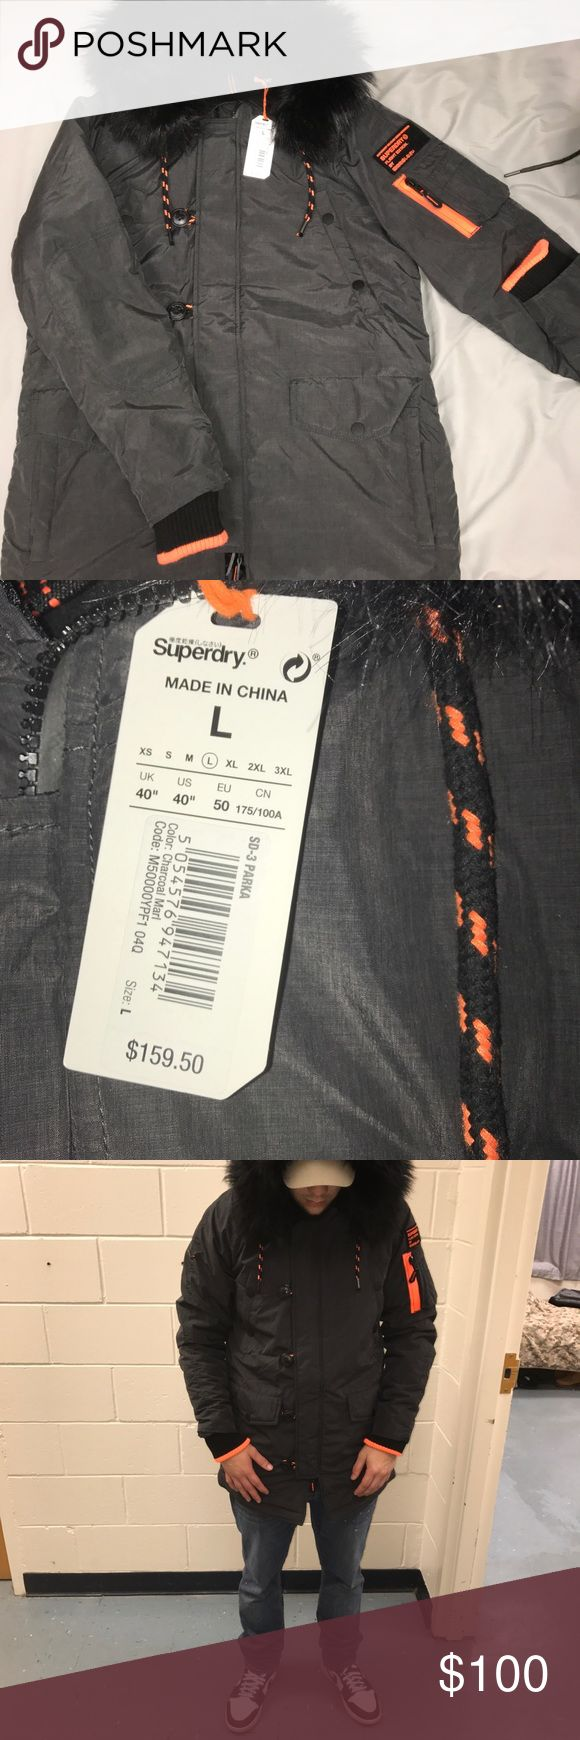 Brand new Super Dry Black Fur Jacket #nike #jordan #adidas #yeezy #puma #fila #champion #underarmour #supreme #bape #vlone #obey #DGK #truereligion #levis #huf #pacsun #forever21 #gap #gucci #fendi #prada #versace #louisvuitton #urbanoutfitters #forever21 #newbalance #reebok #10deep #zumiez #tommyhilfiger #Graw #express #armaniexchange #nfl #nba #clothes #shirt #pants #polo Super Dry Jackets & Coats